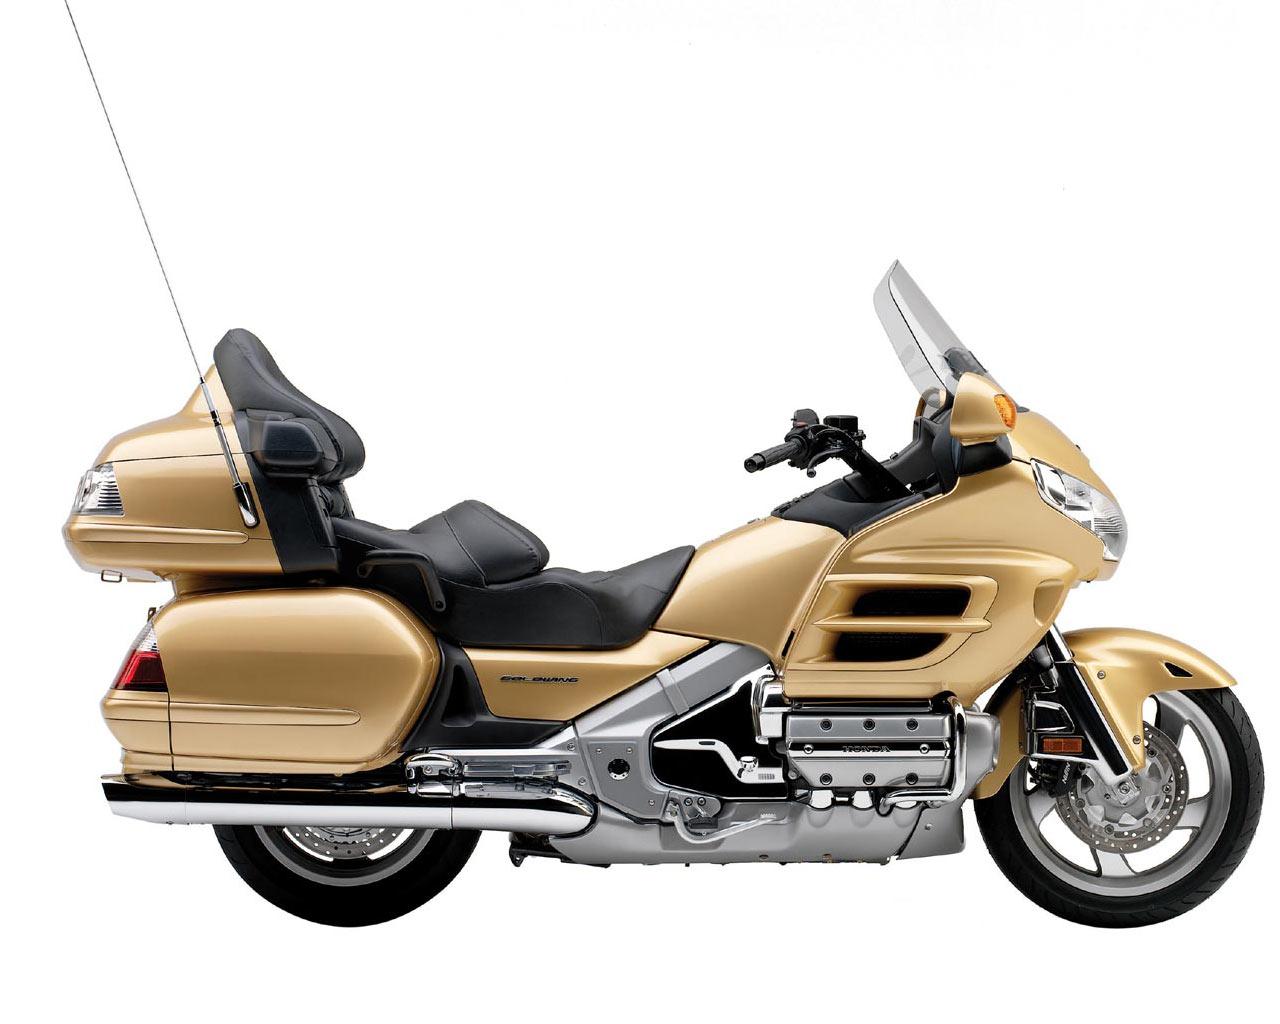 Мотоцикл хонда голд винг фото